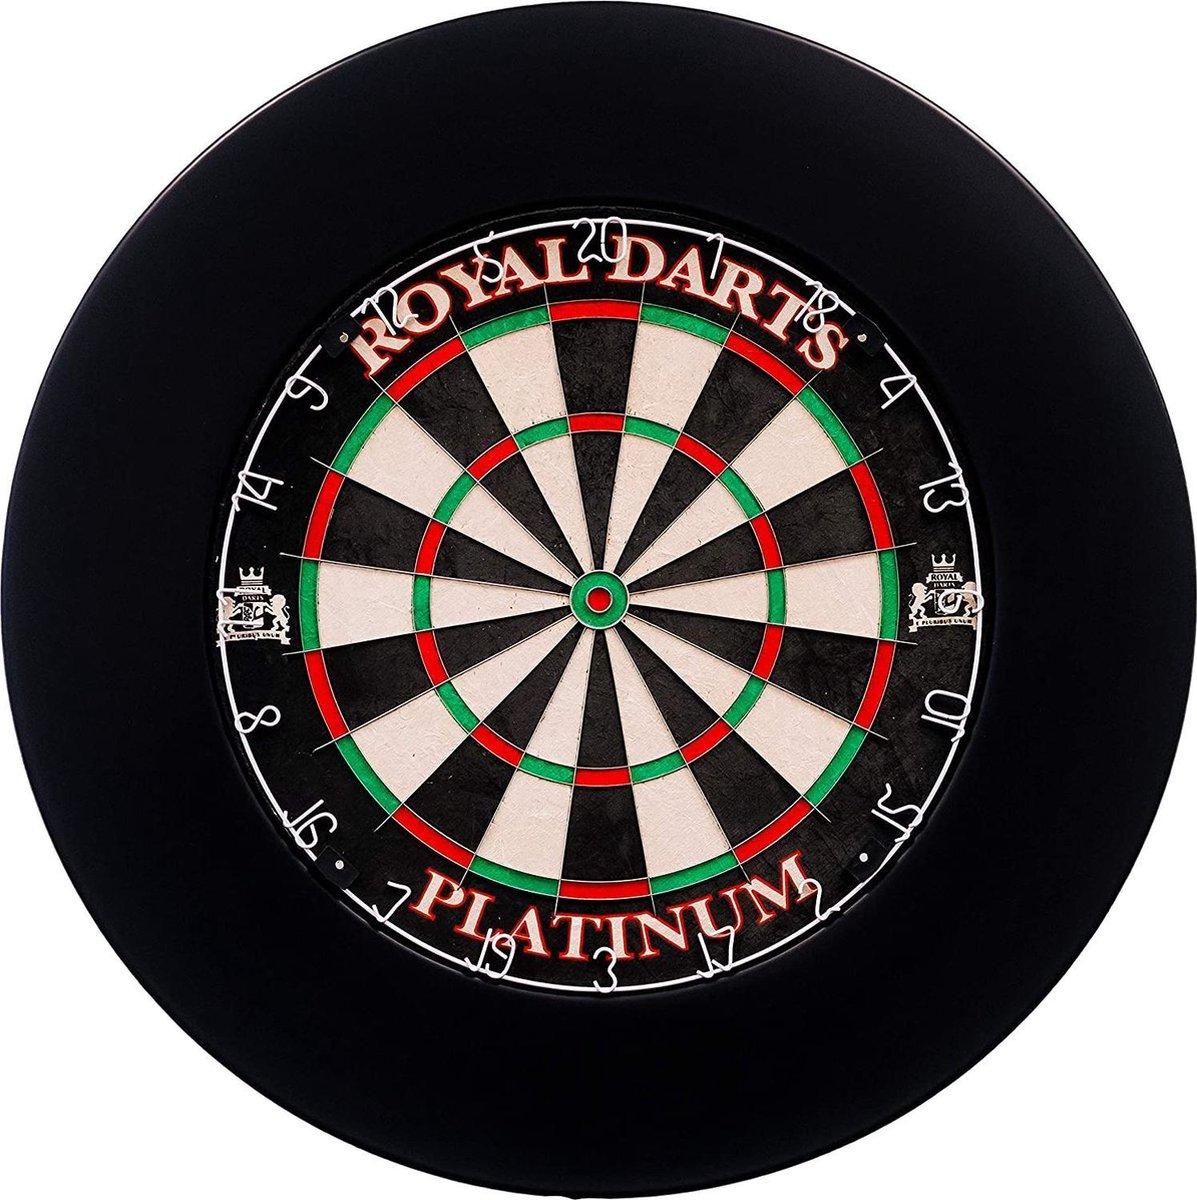 Dartbord Surround Ring - Zinaps Darts Dartboard Surround-(wk 02127)